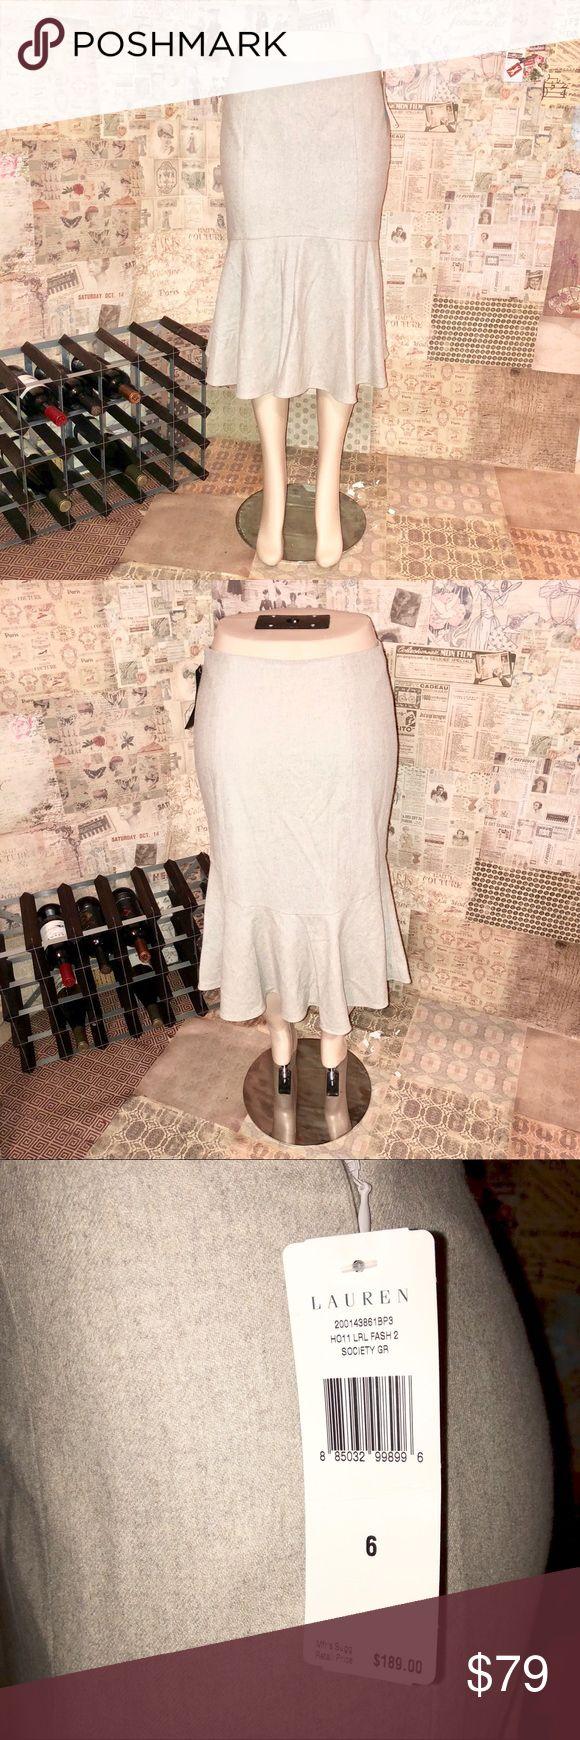 Lauren by Ralph Lauren Tulip Midi Skirt It's brand new with tags.  Very nice fabric :)  Size: 6. Lauren Ralph Lauren Skirts Midi